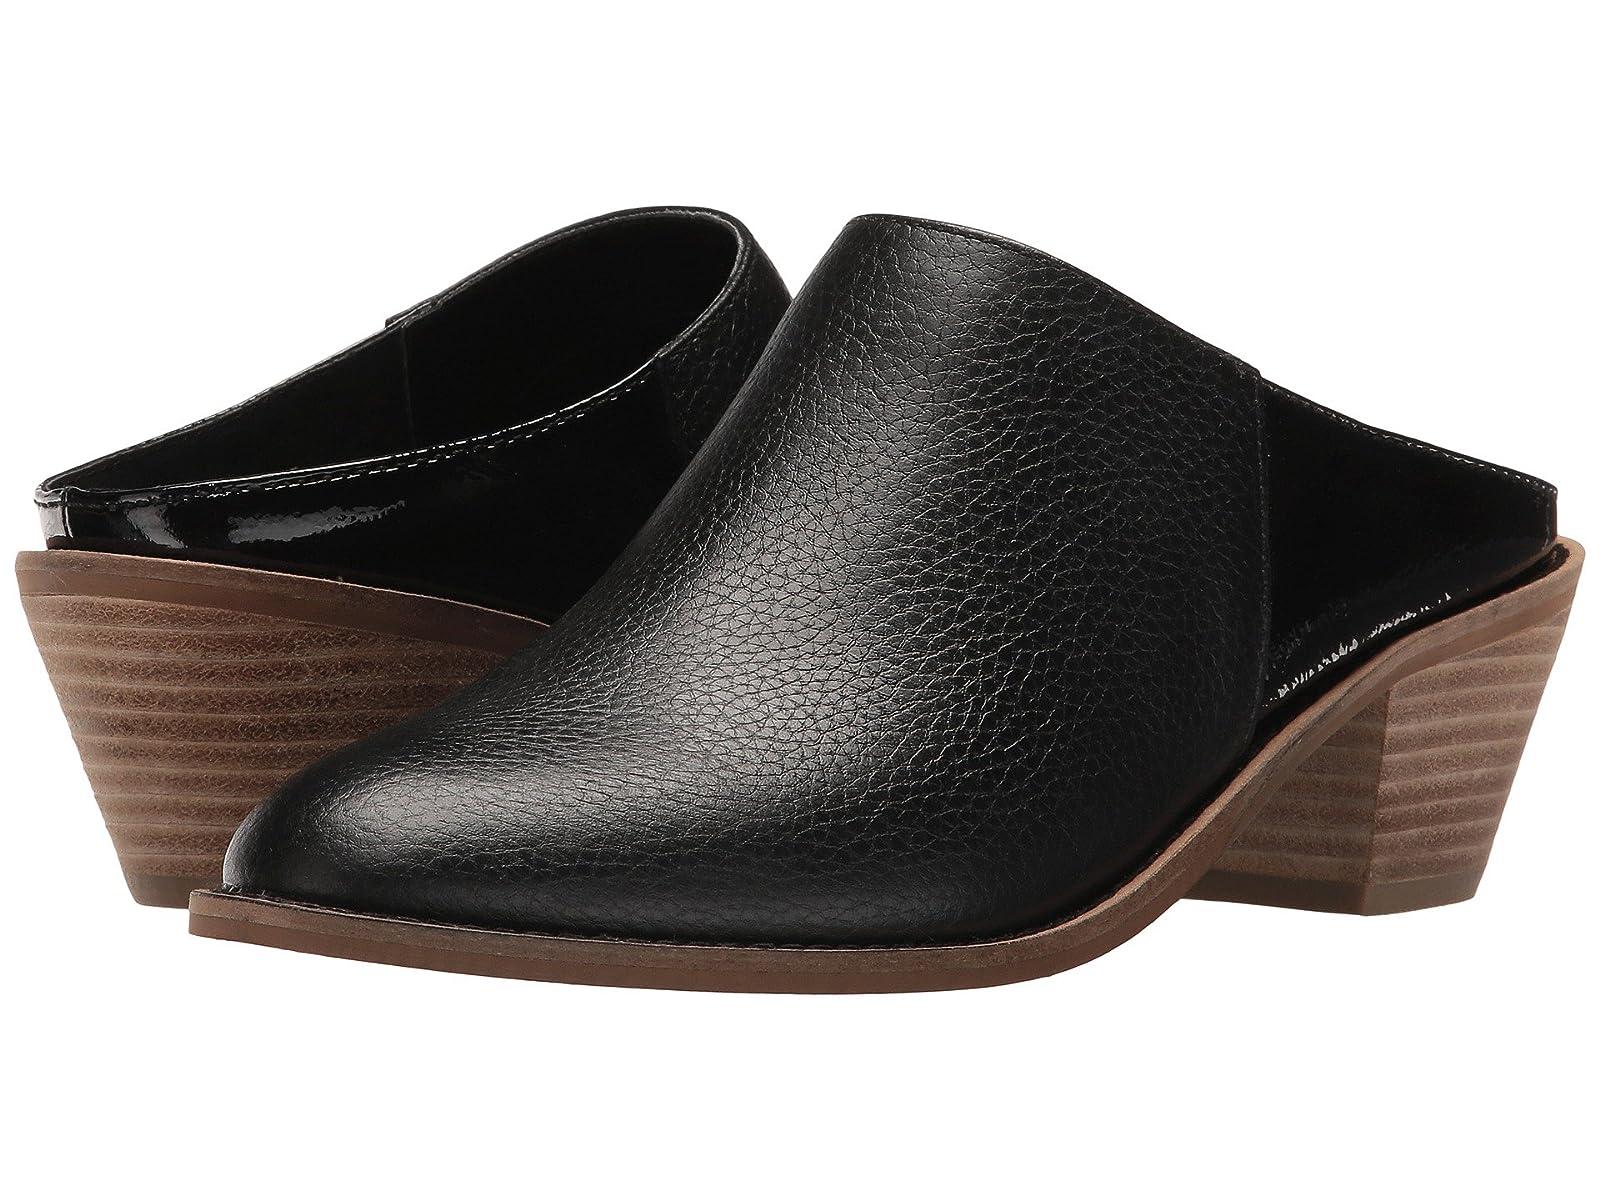 Kelsi Dagger Brooklyn KellumCheap and distinctive eye-catching shoes